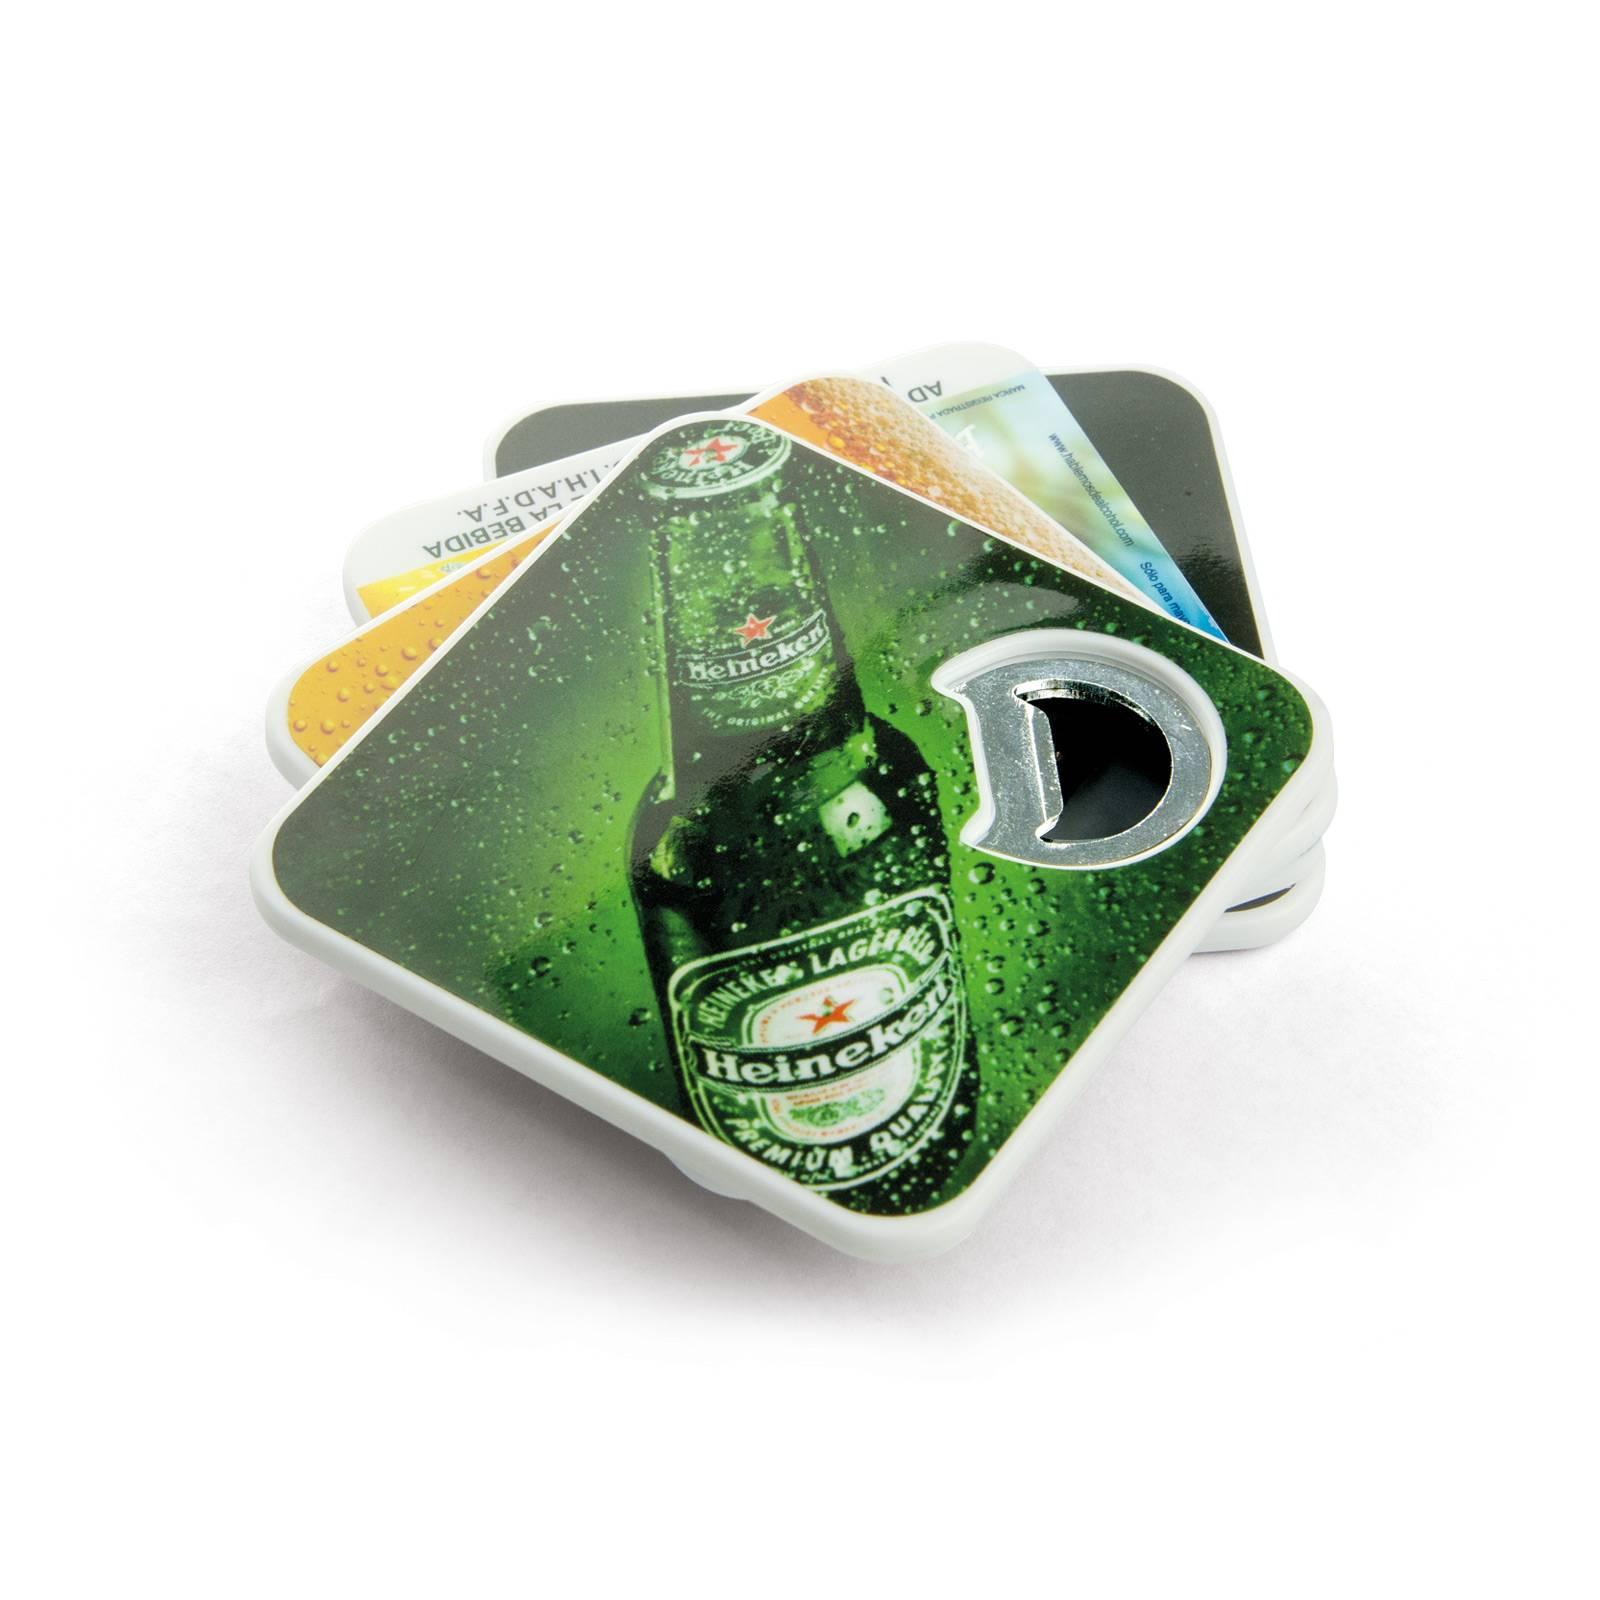 Bottle Opener Coasters